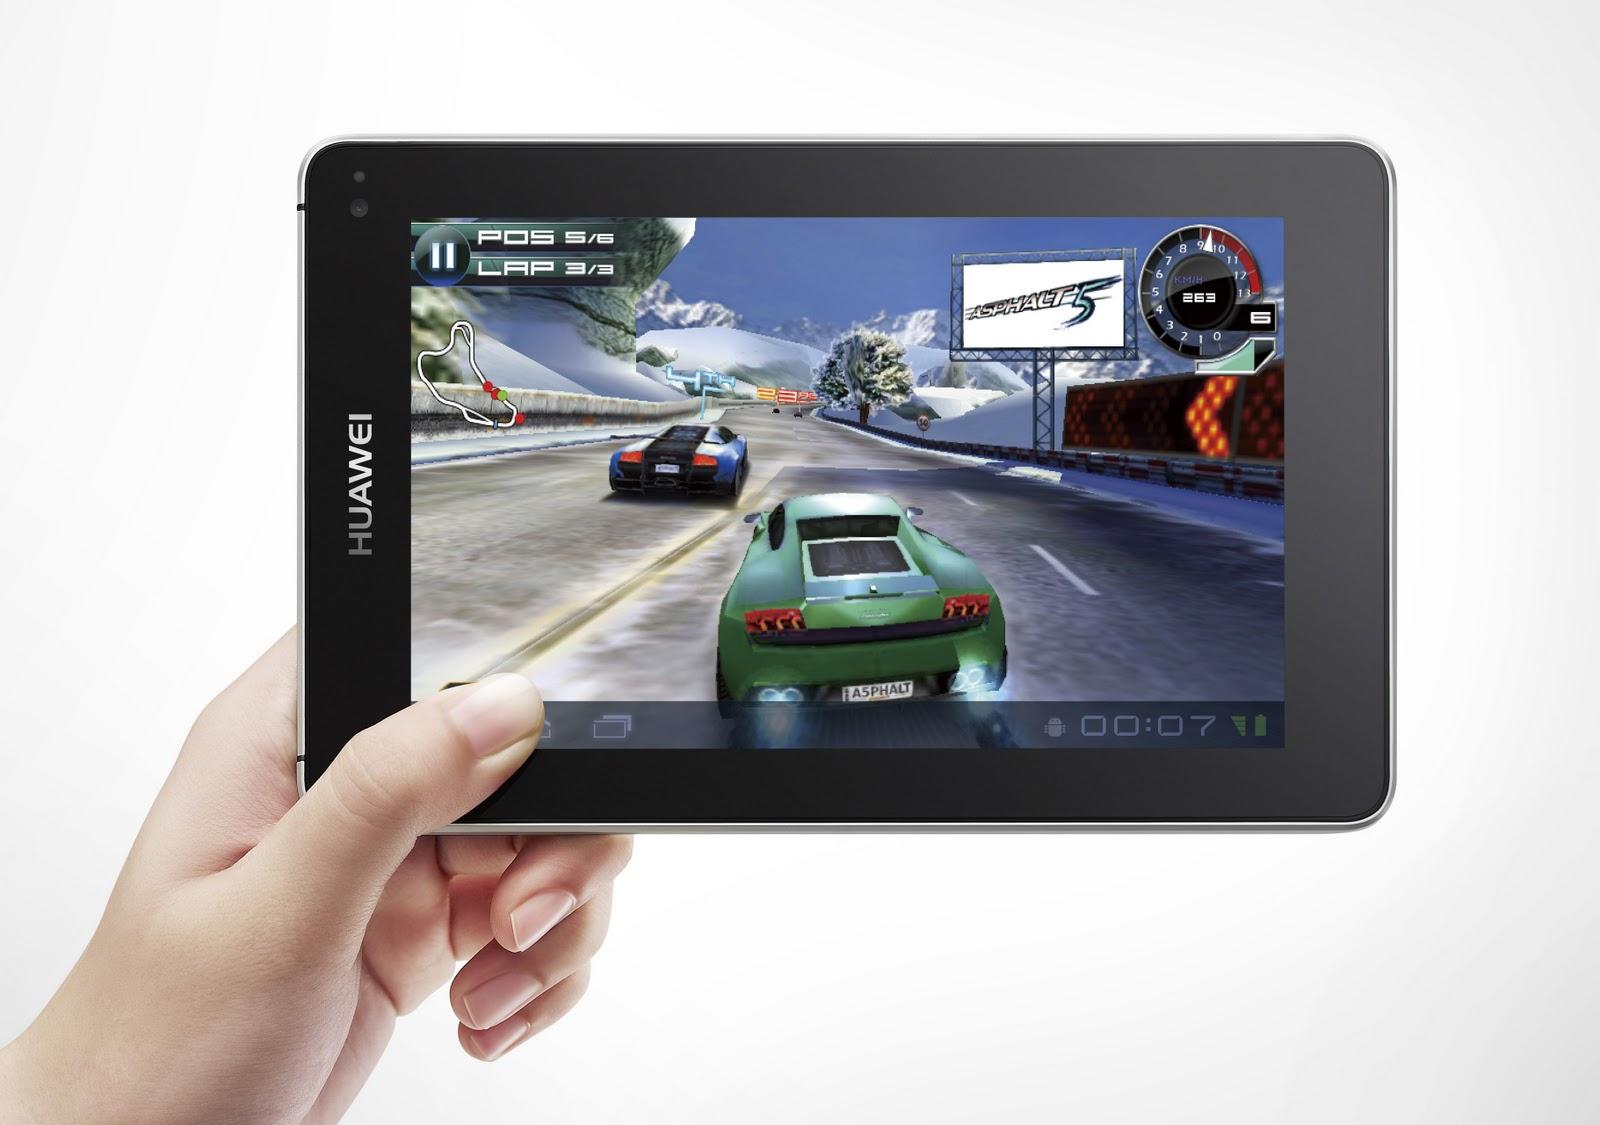 Harga Tablet Huawei MediaPad Rp. 4.000.000,-